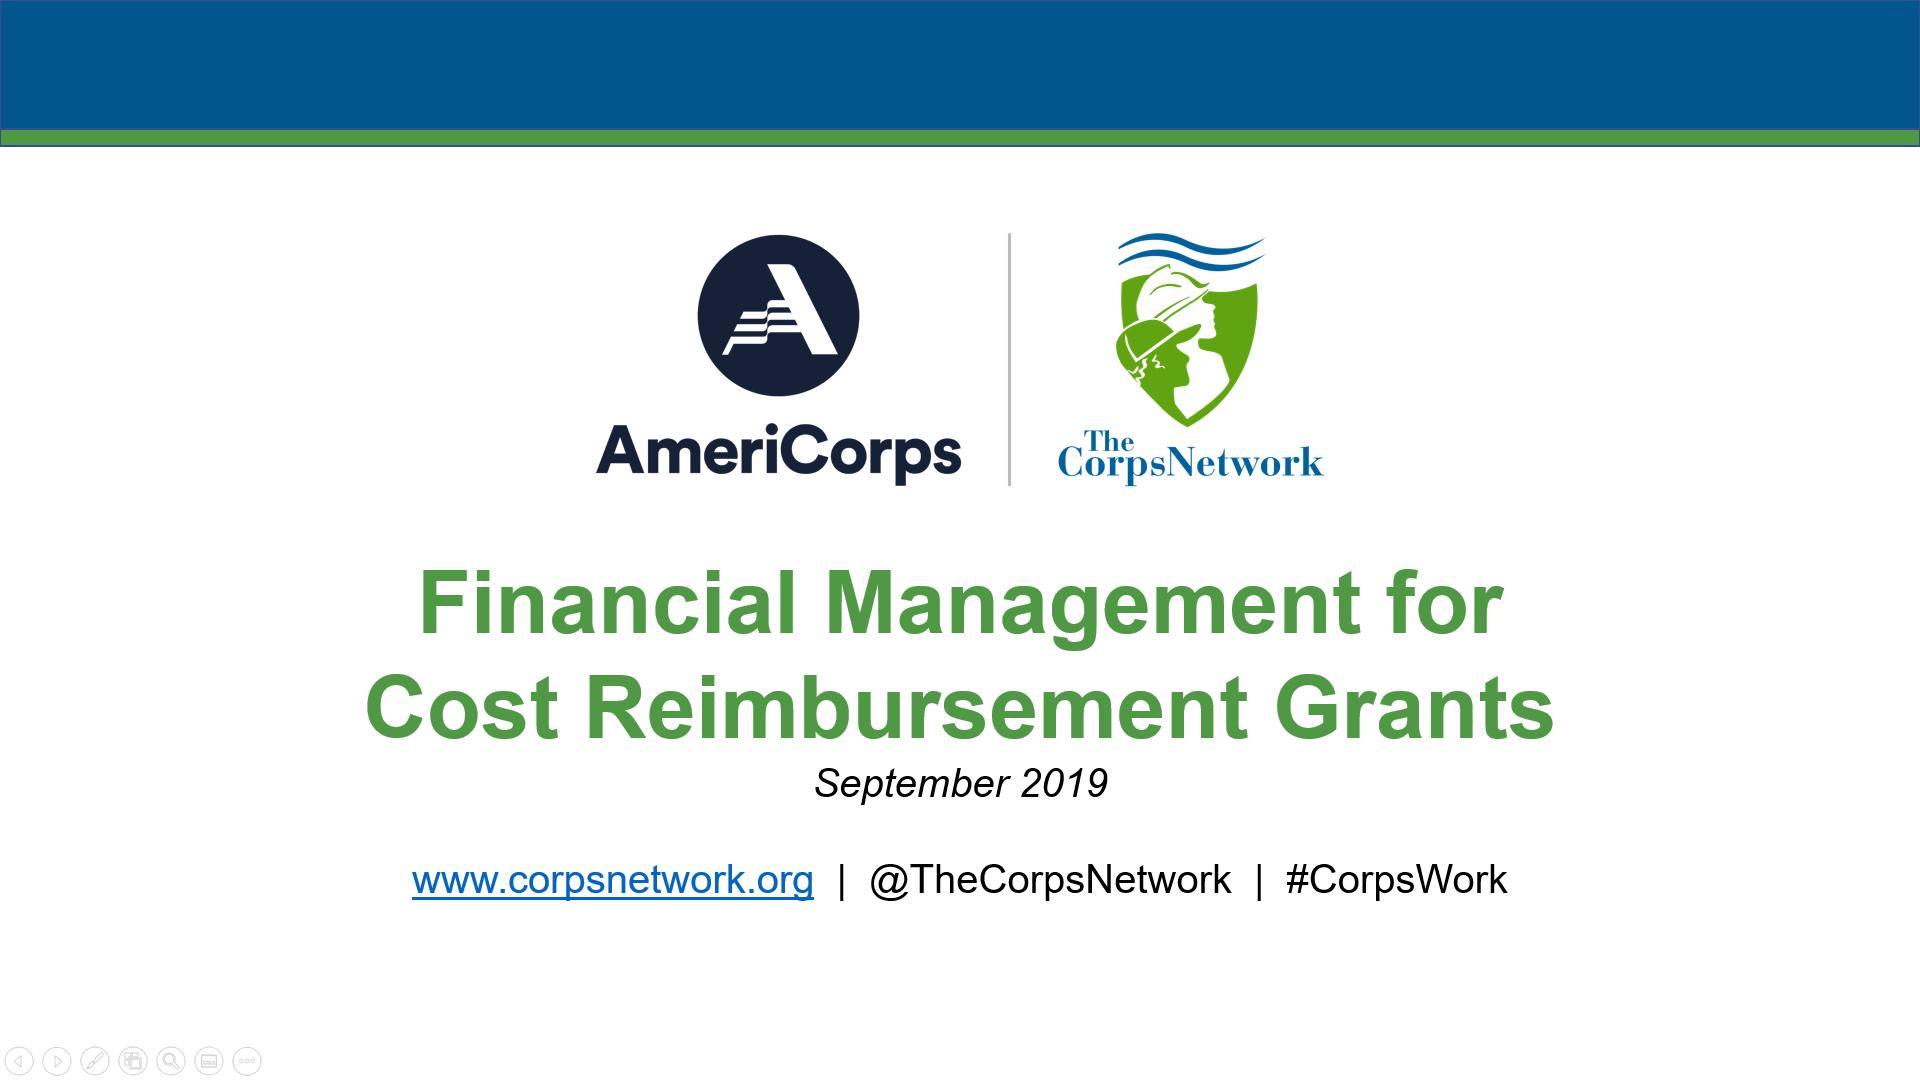 Financial Management for Cost Reimbursement Grants